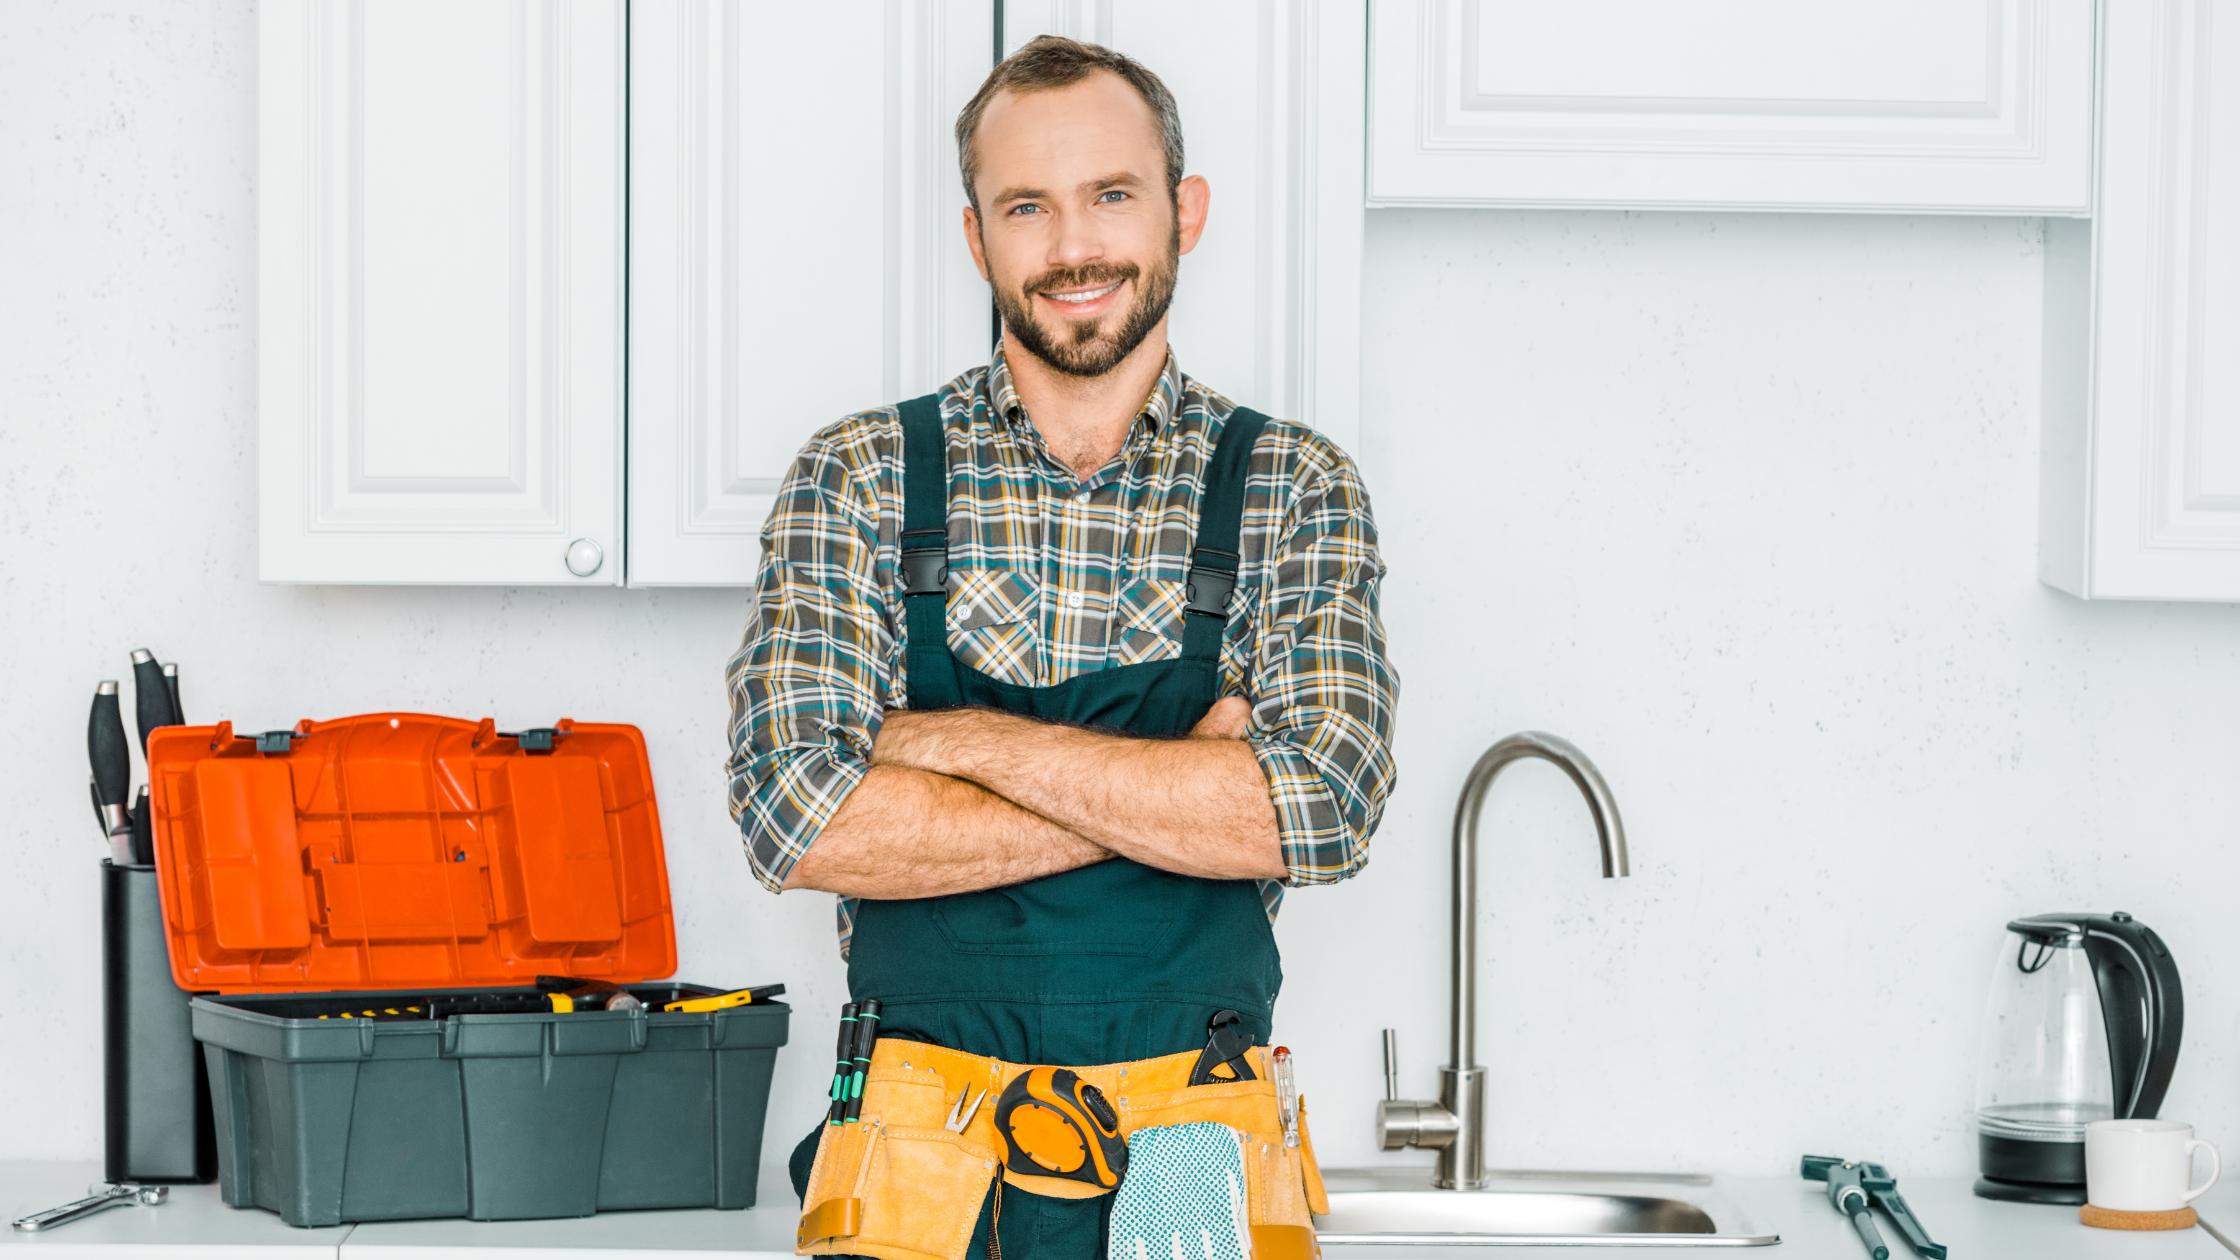 Kitchener Handyman that's Trusted